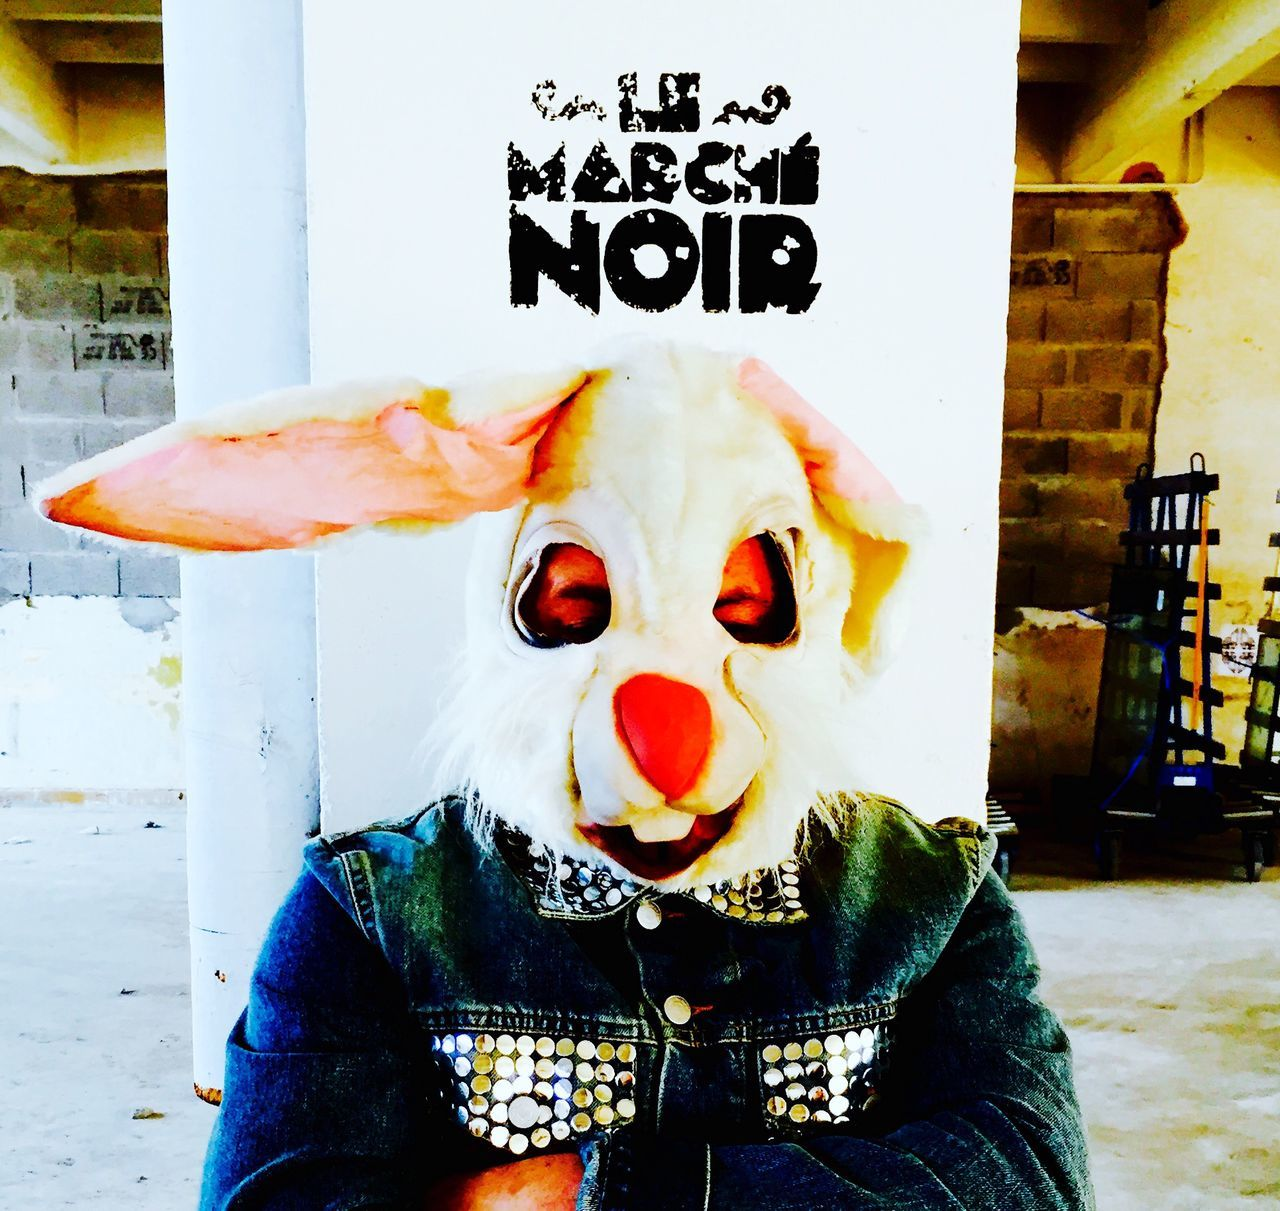 Man In Rabbit Mask Against Column In Building